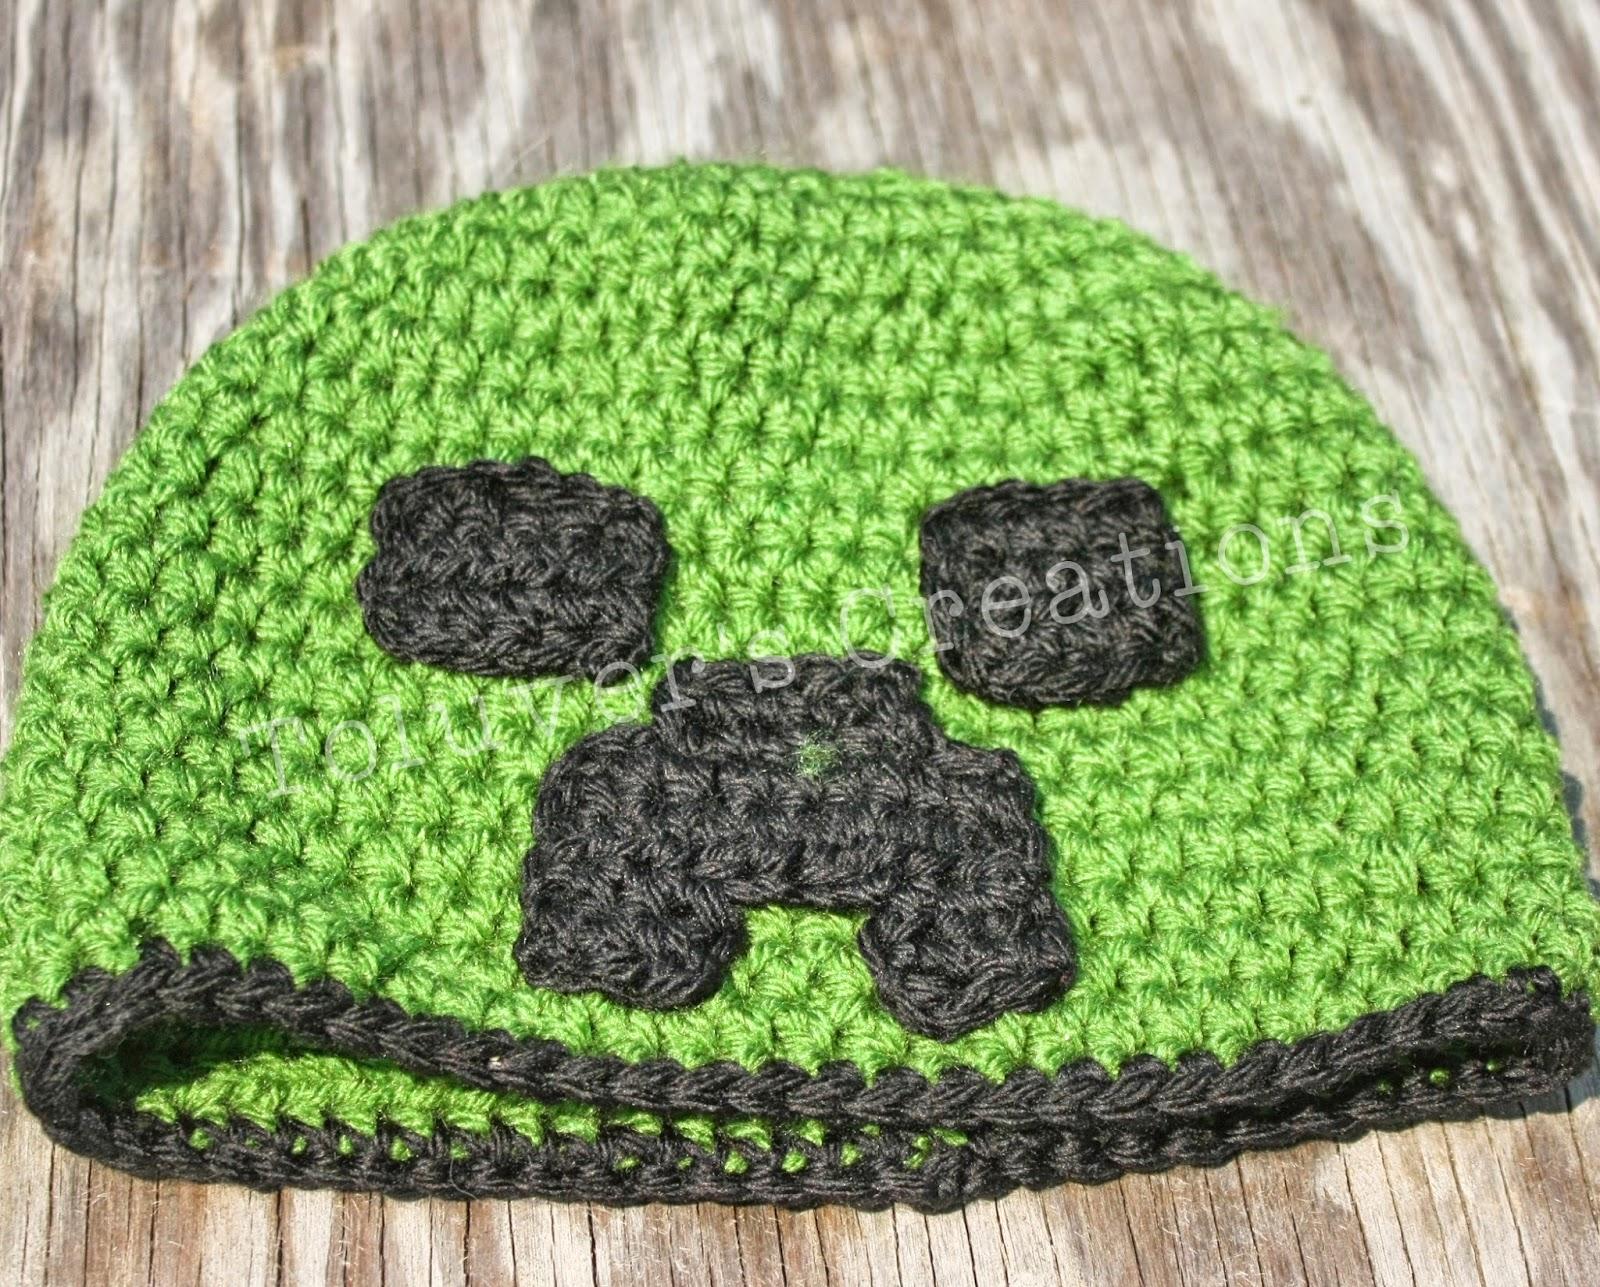 613b5138856 Toluver s Creations  MineCraft Creeper Hat Free Pattern